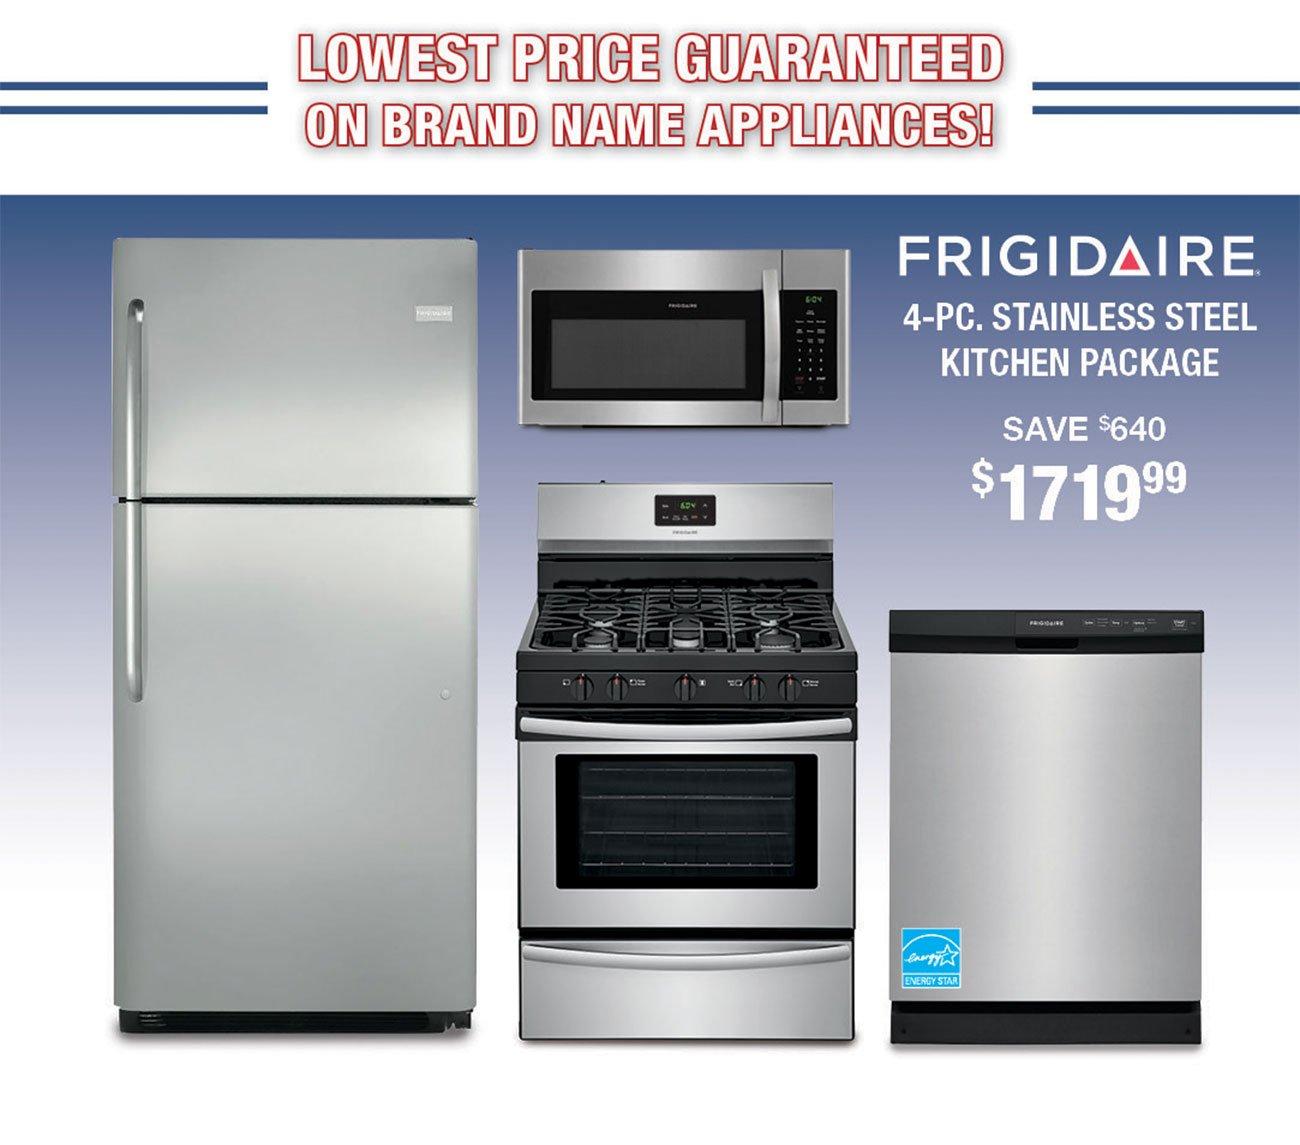 Frigidaire-Stainless-Steel-Kitchen-Package-UIRV